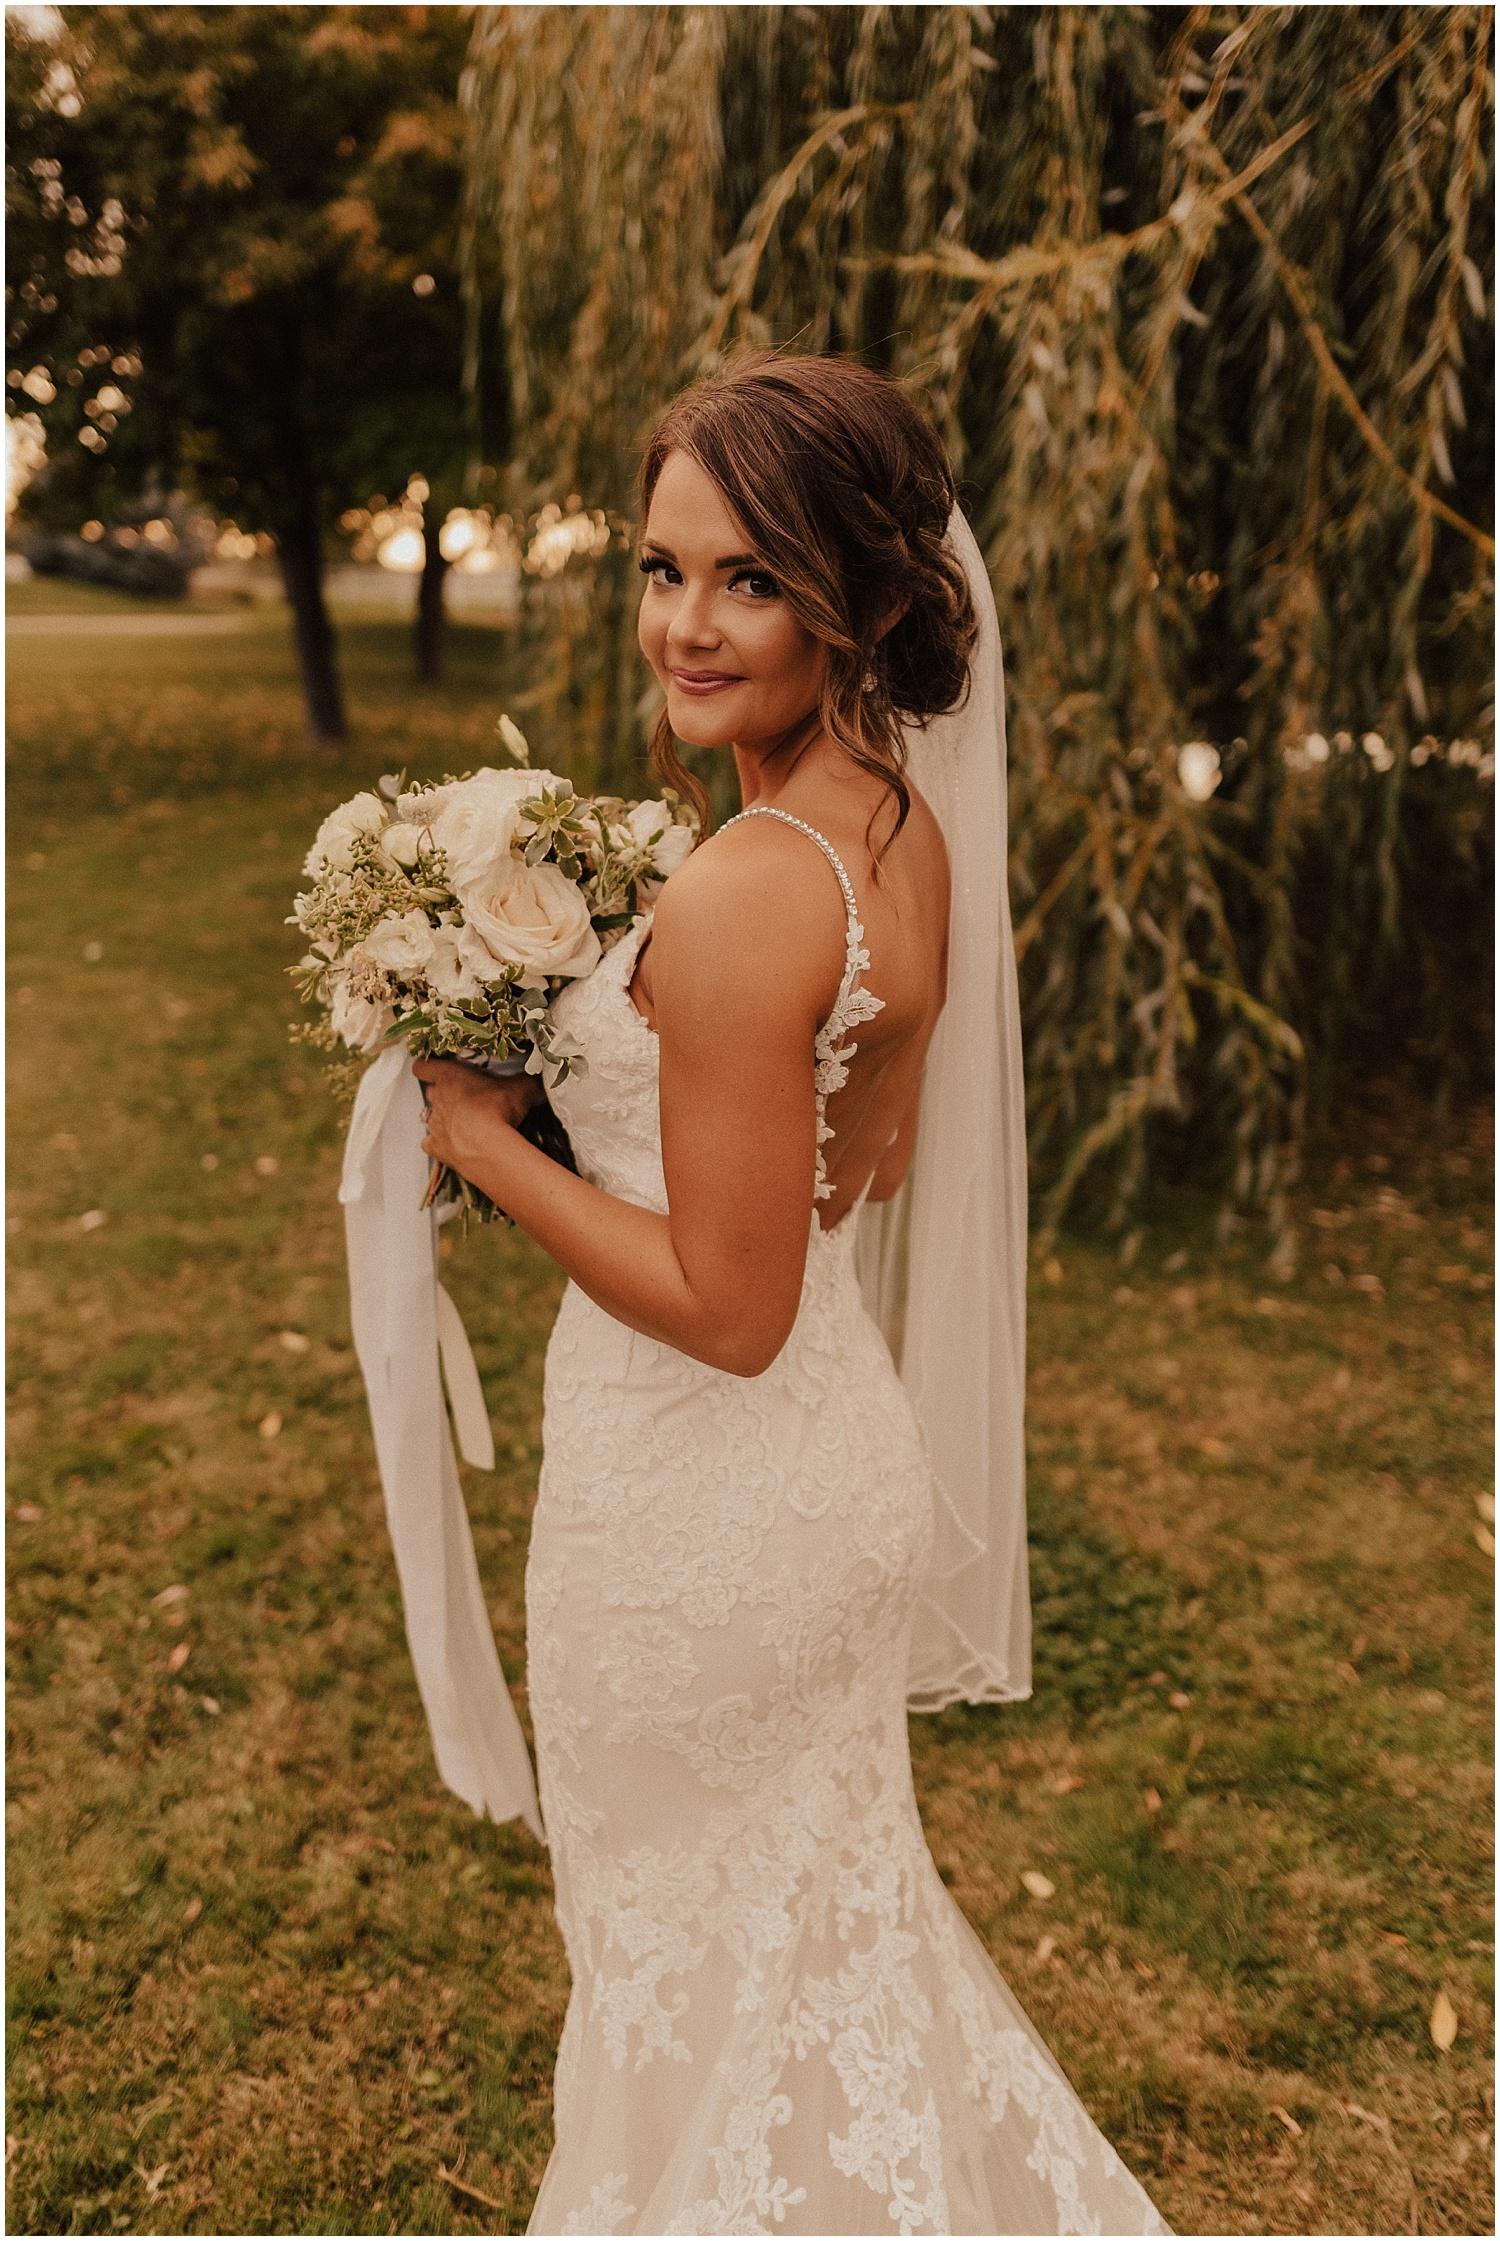 whimsical-summer-wedding-boise-idaho-las-vegas-bride160.jpg